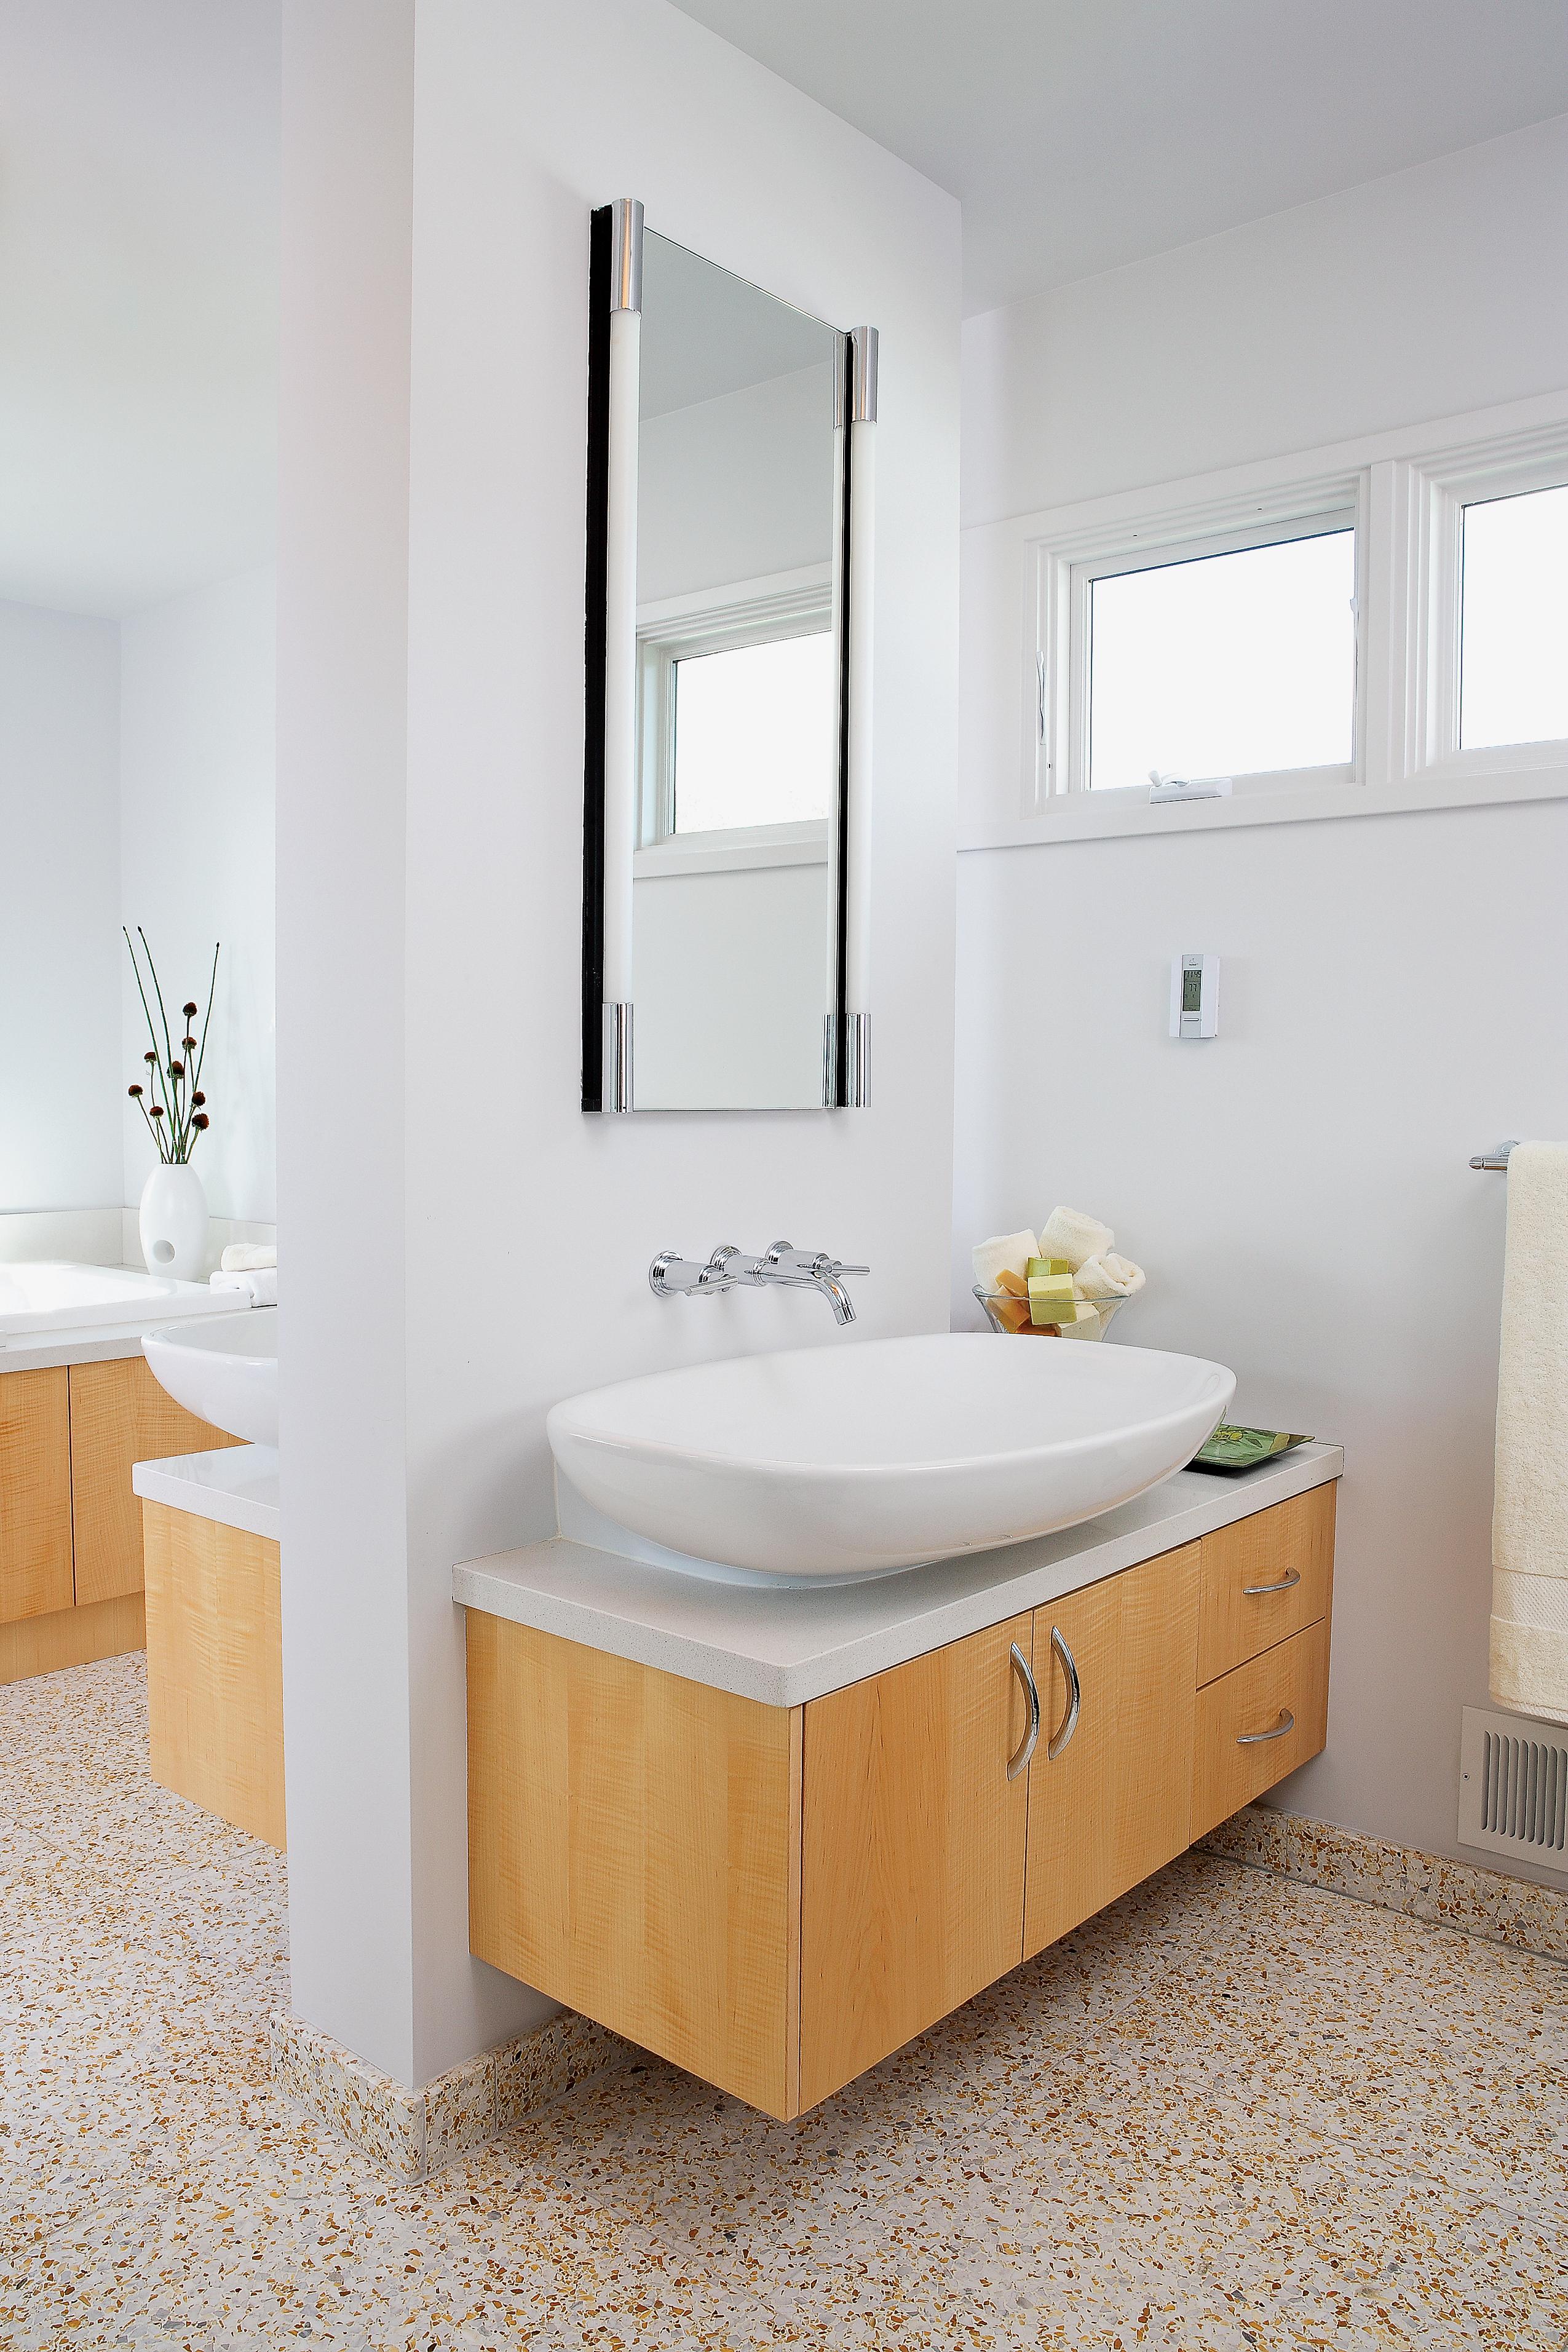 12 ideas for bathroom counters sunset magazine